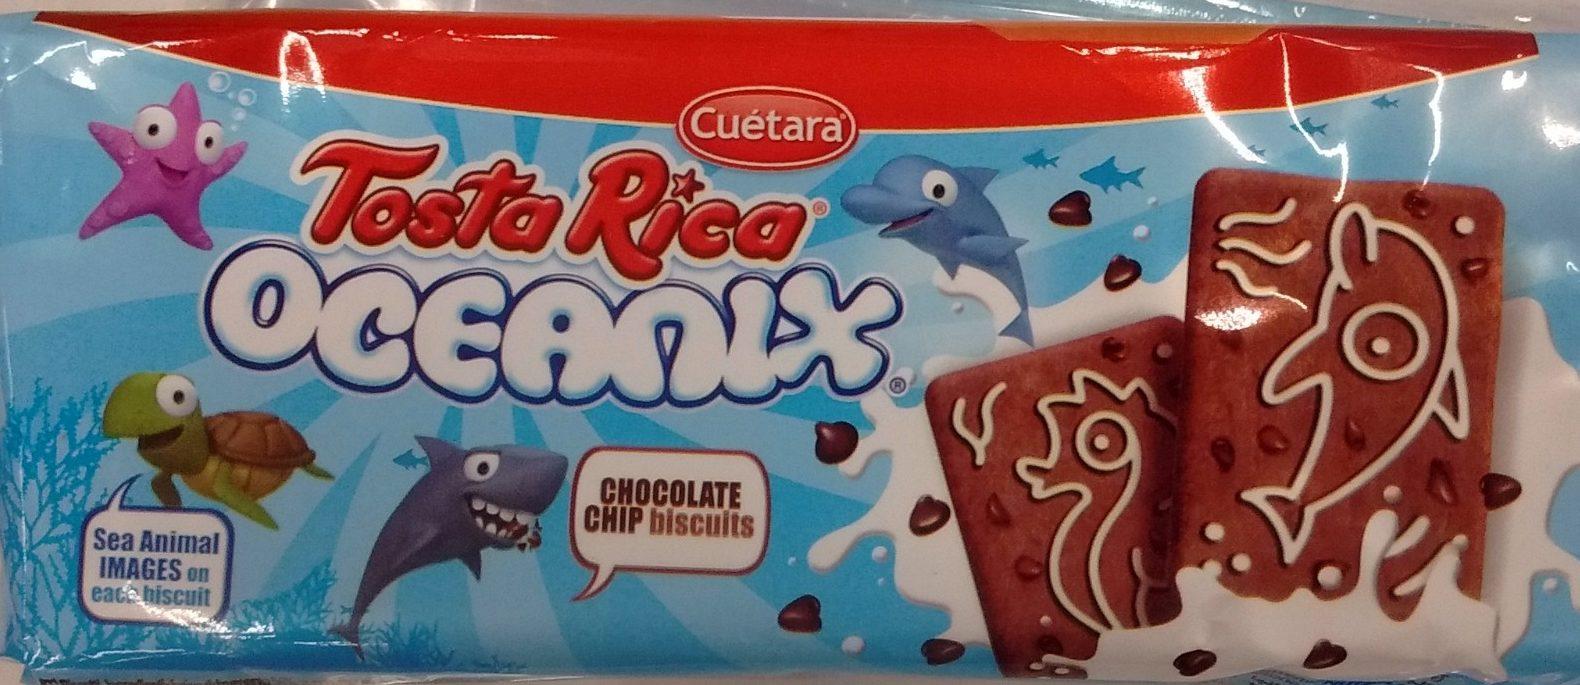 Tosta Rica Oceanix - Product - fr